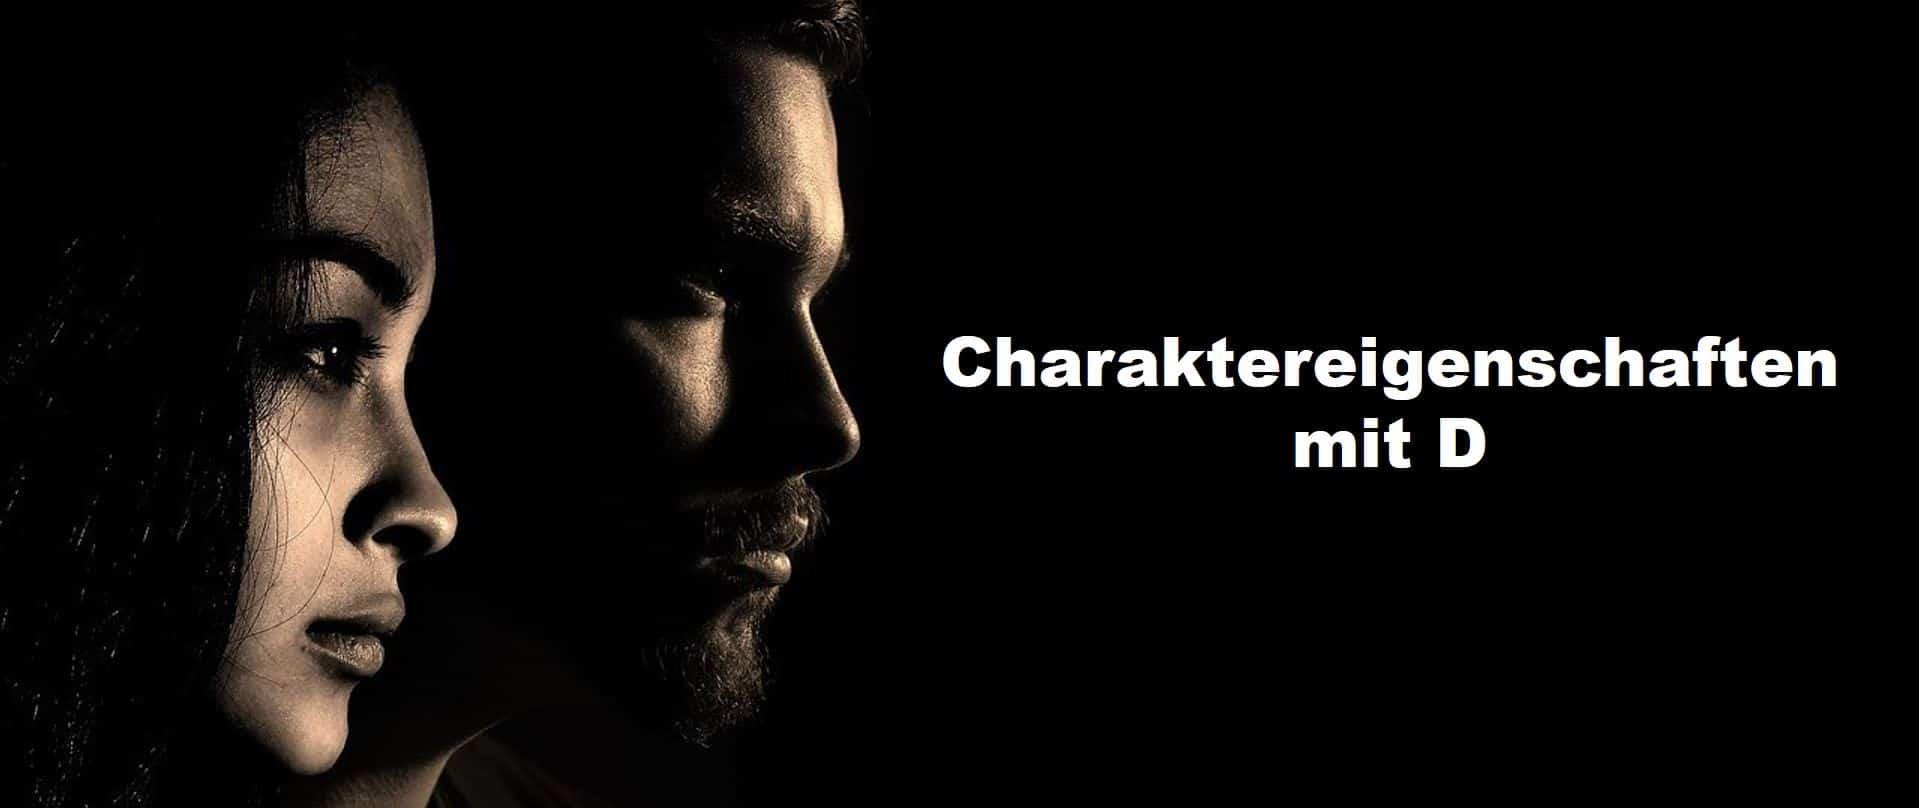 Charaktereigenschaften als Adjektive mit D